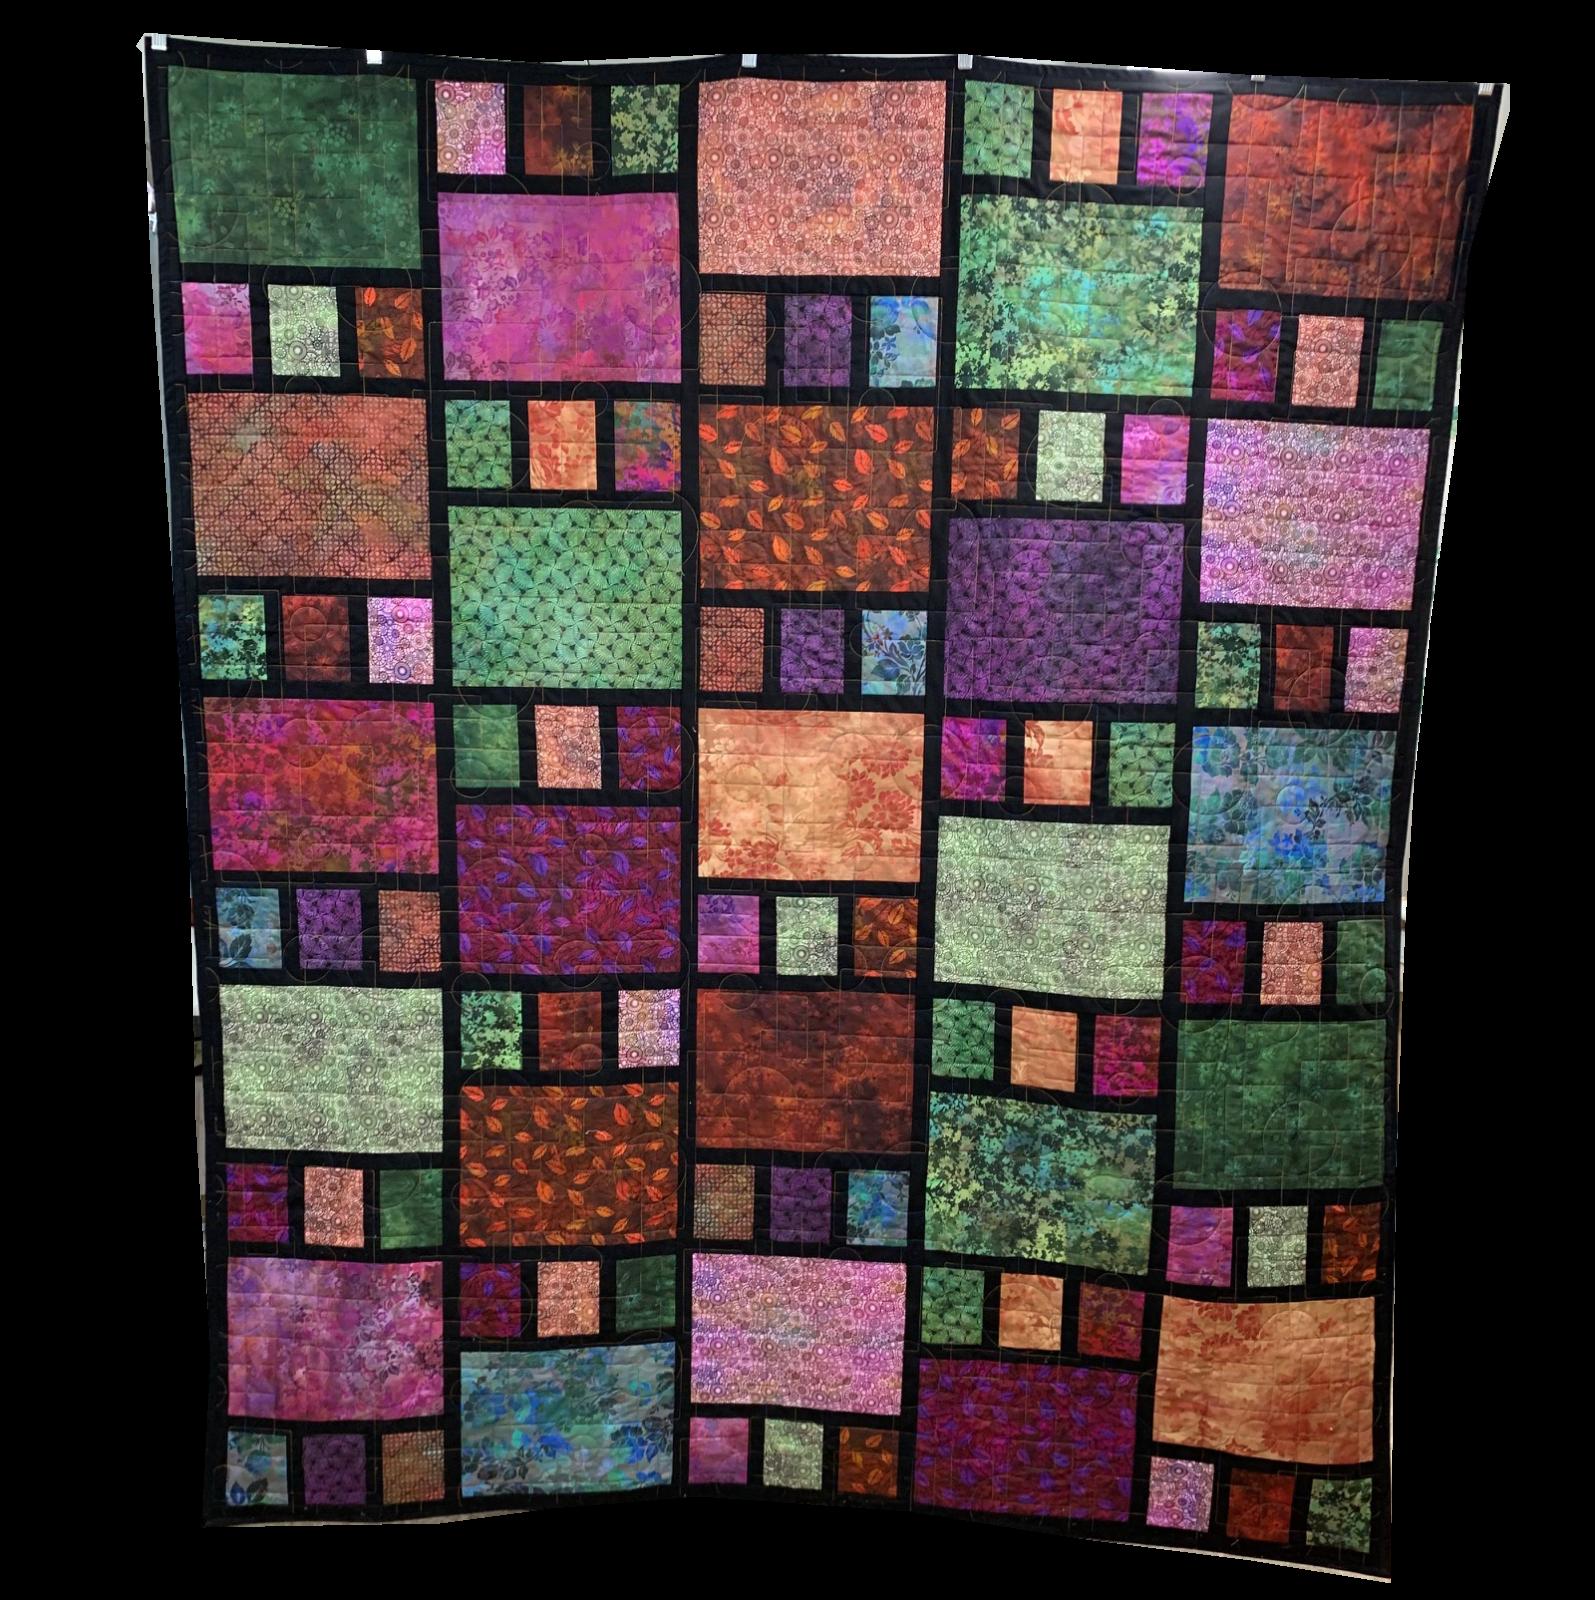 Craftsman Quilt Kit - Create This Stunning Quilt